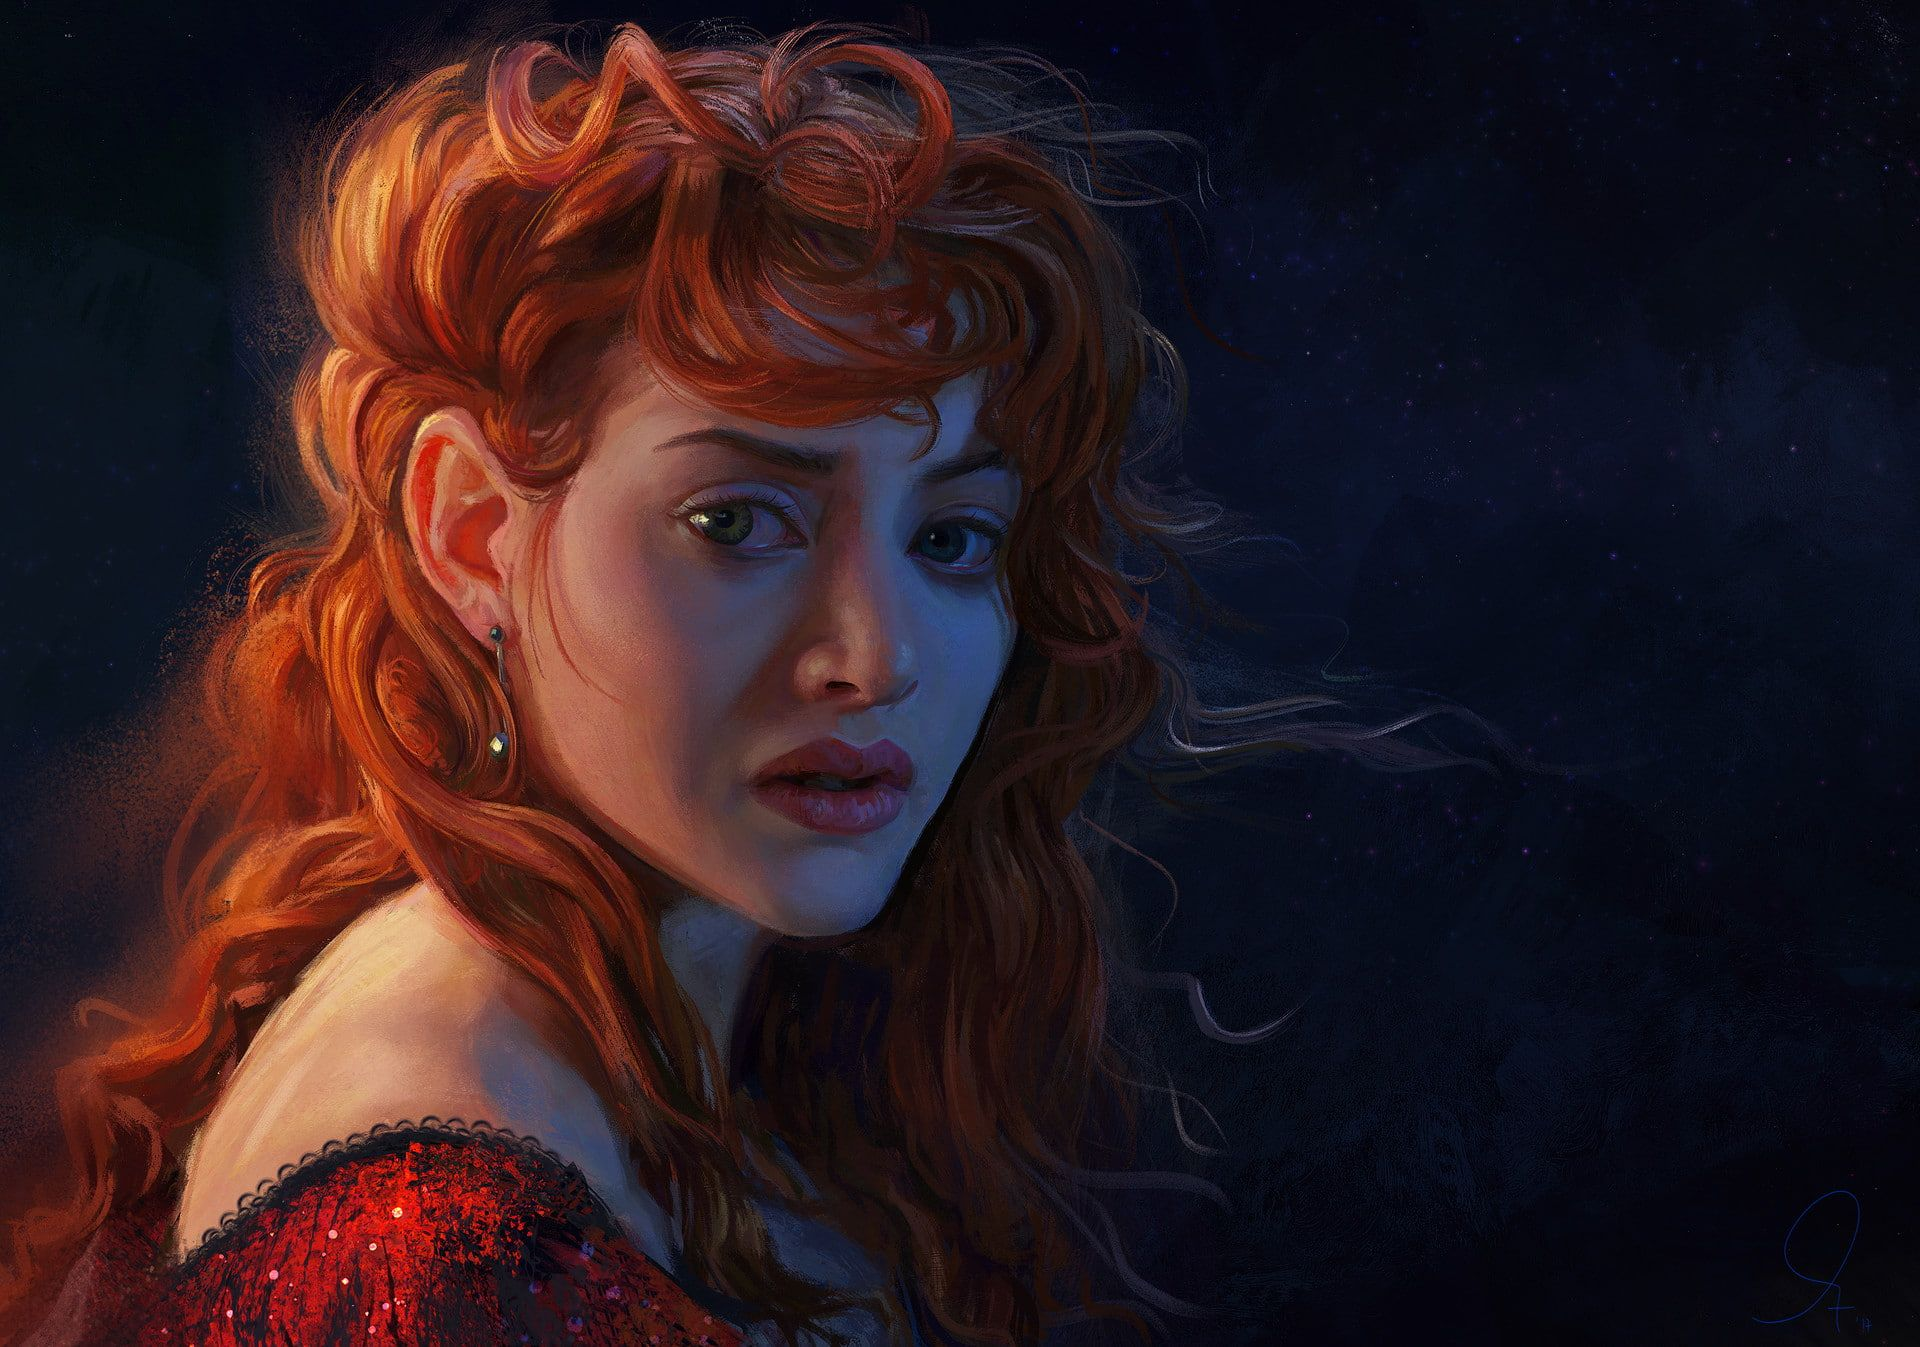 Kate Winslet Women Redhead Digital Art 1080p Wallpaper Hdwallpaper Desktop In 2020 Titanic Art Portrait Kate Winslet